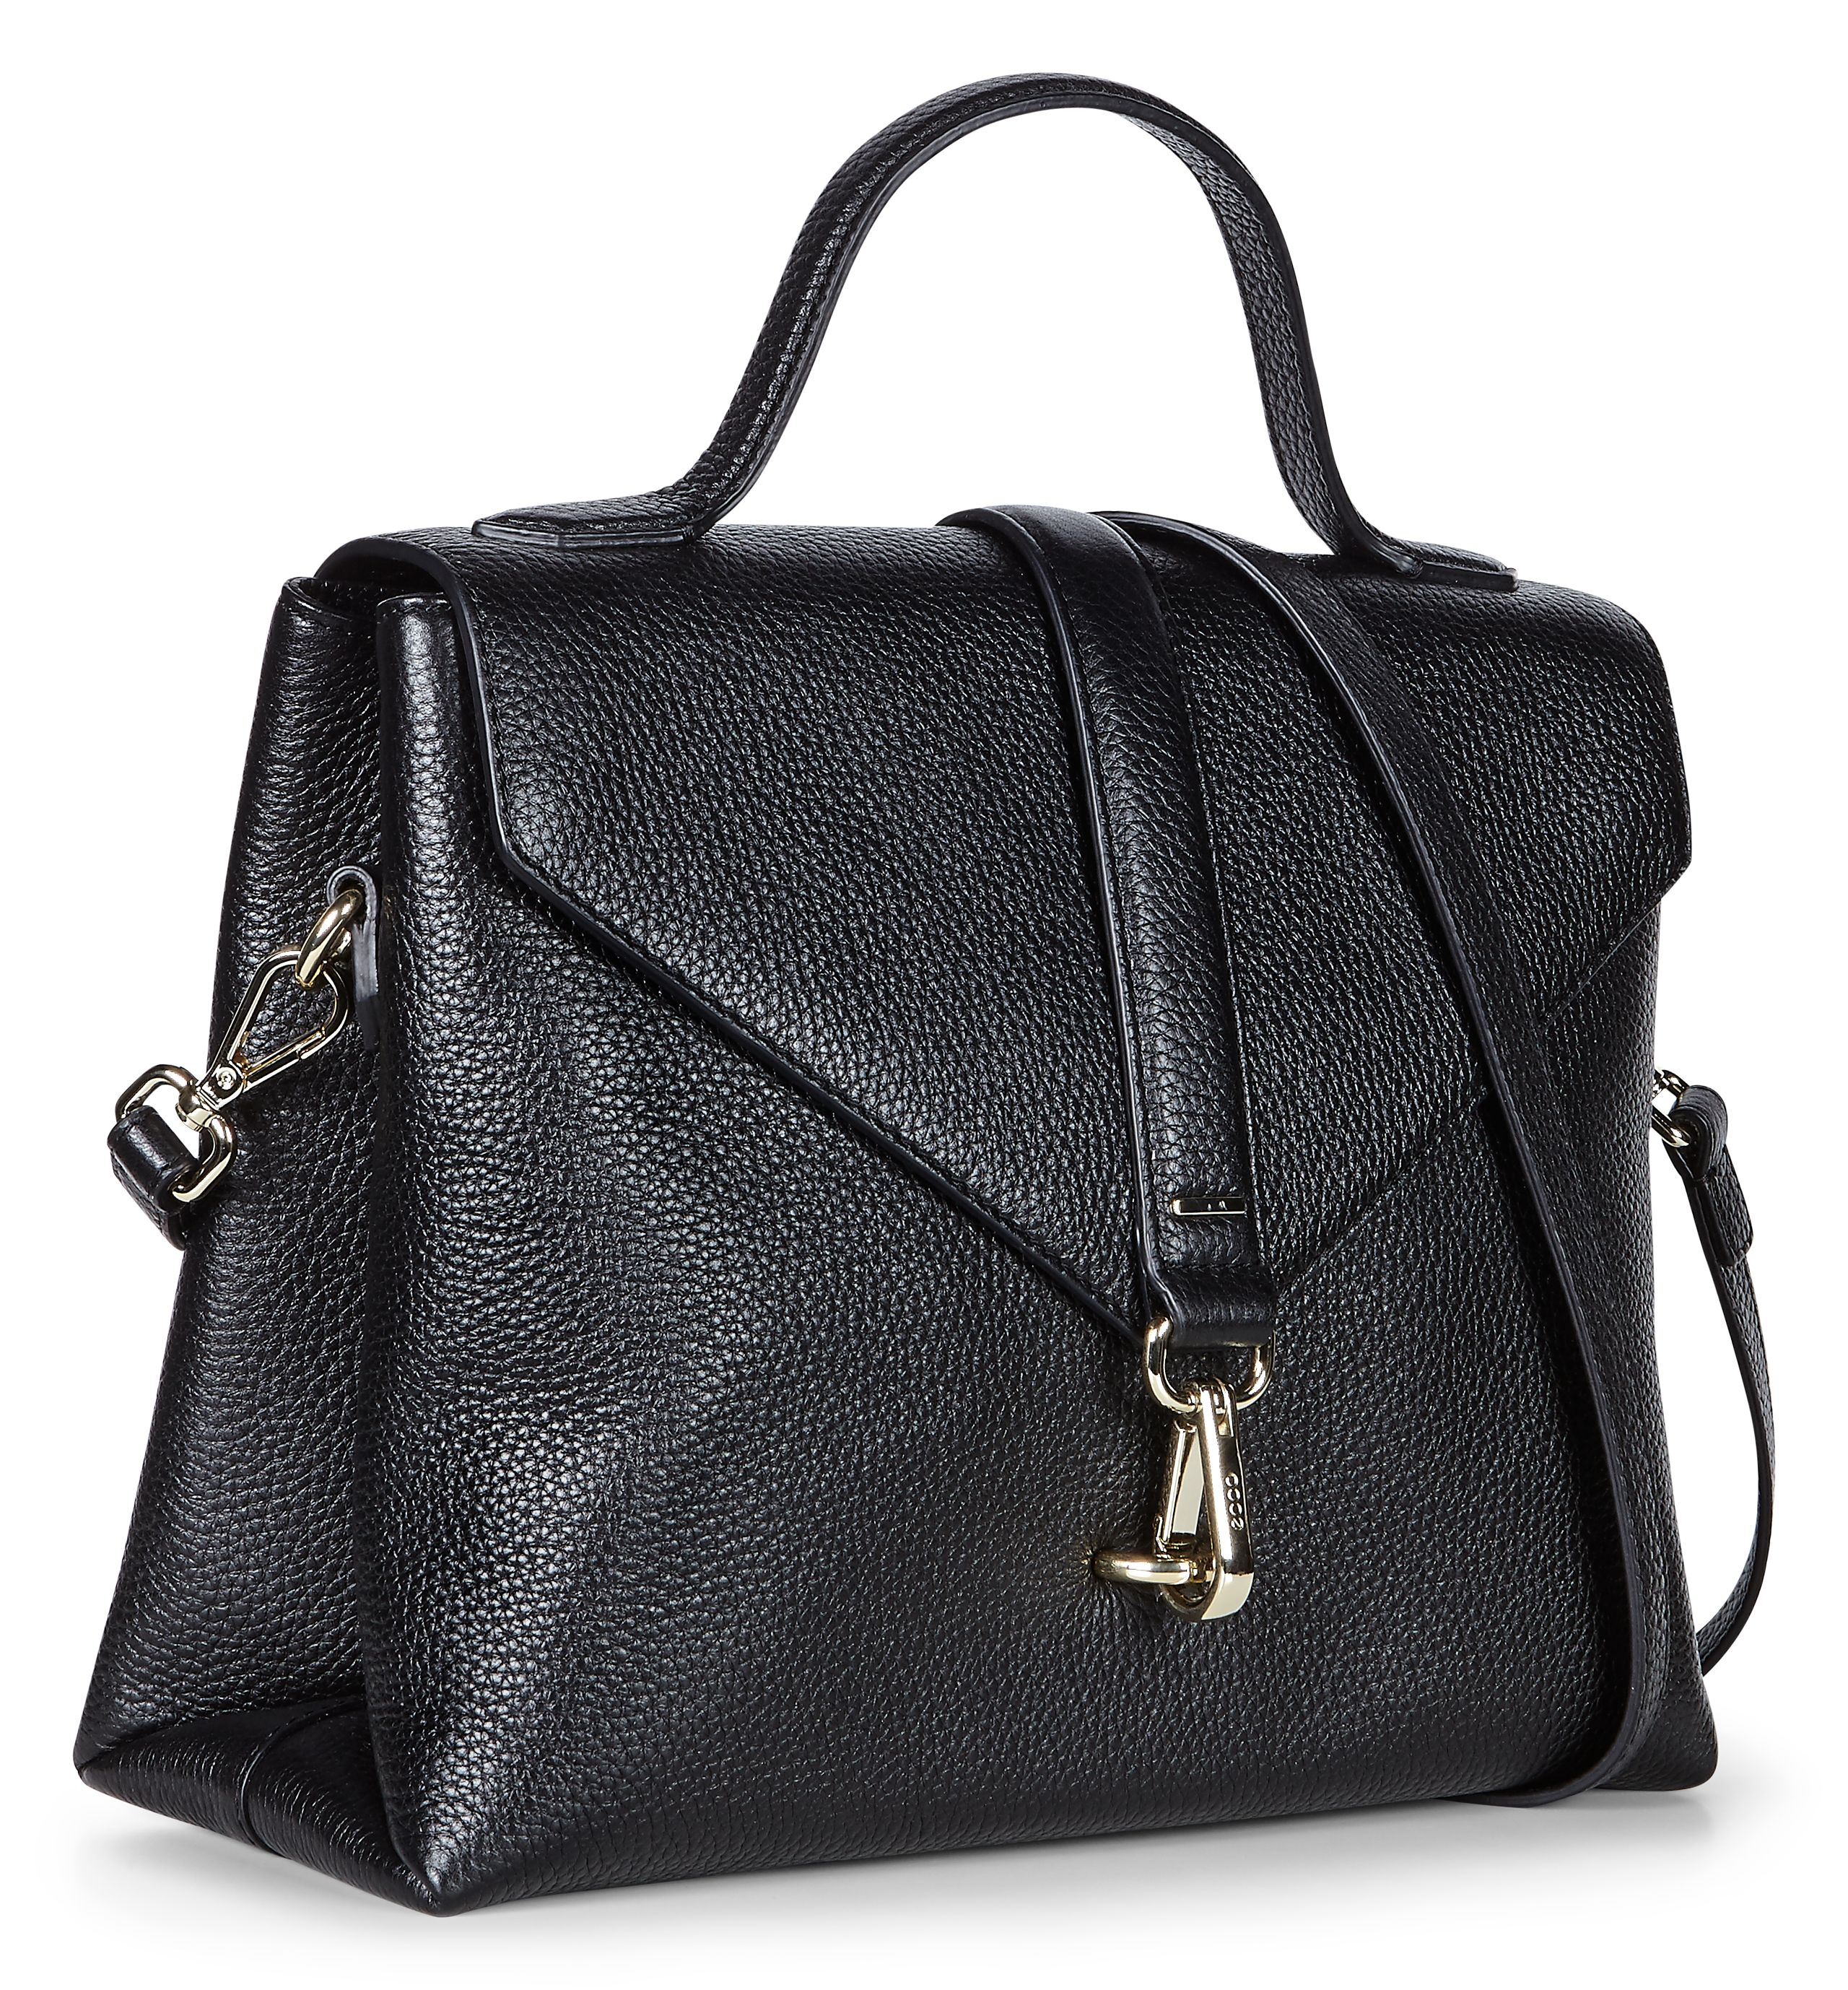 Isan Handbag (Black) ...